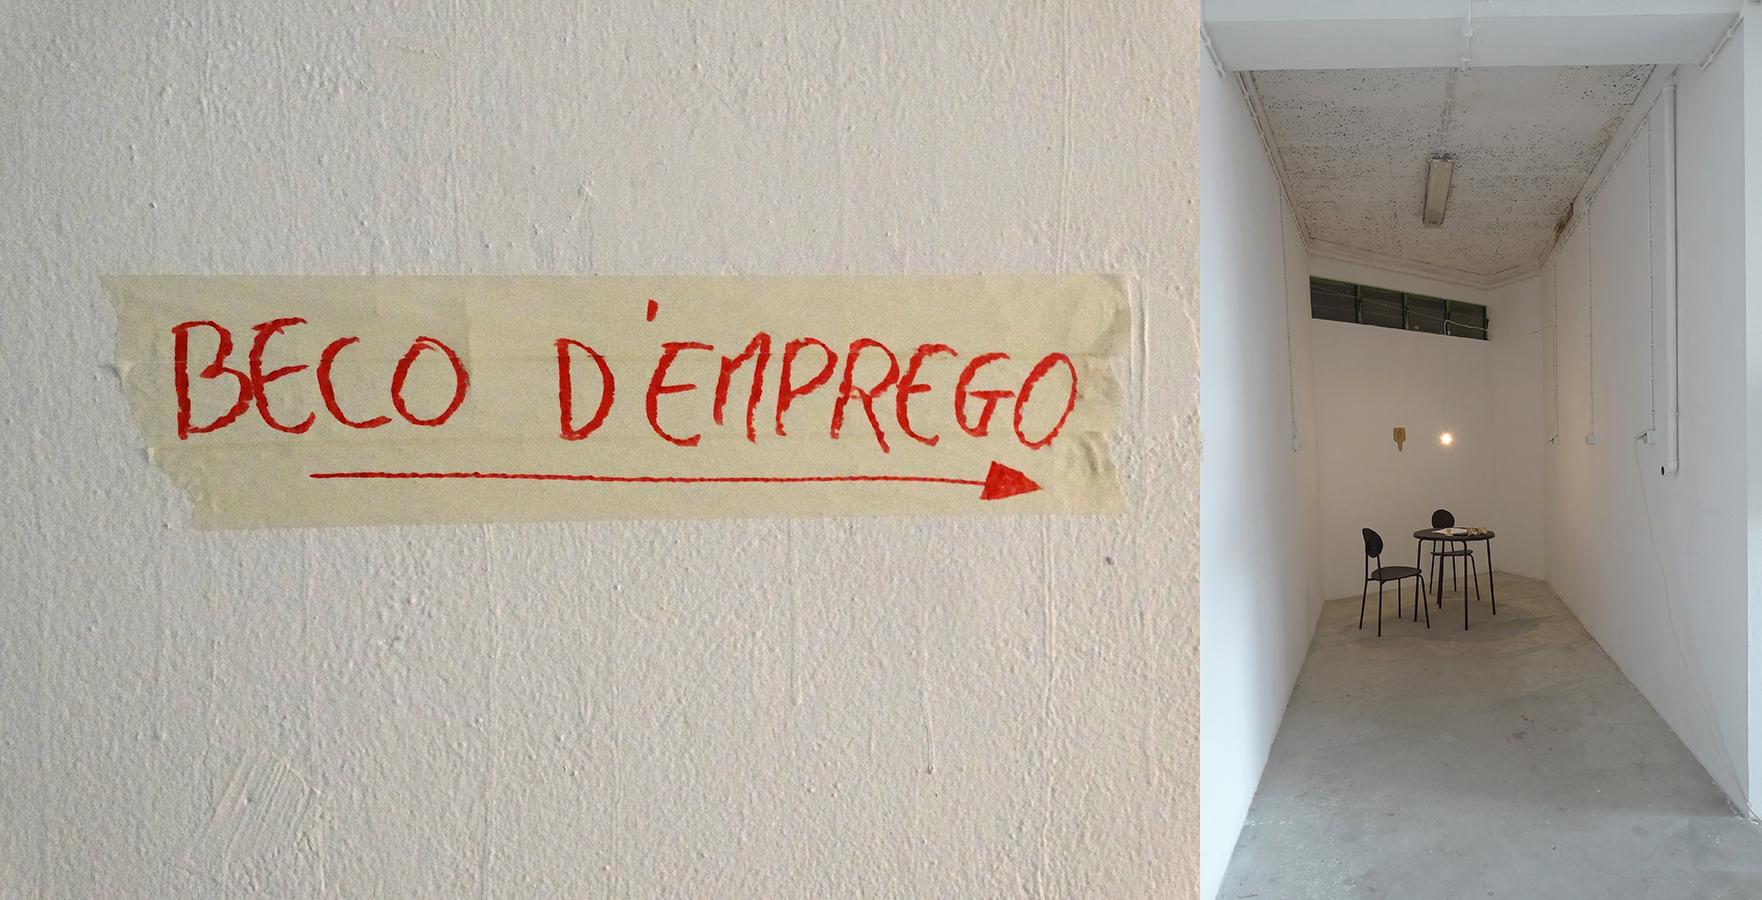 "Thierry Ferreira, beco d'emprego 2016, Fotografia, Photography, art, arte, Startstop ""Beco d'Emprego"" na web summit 2016"